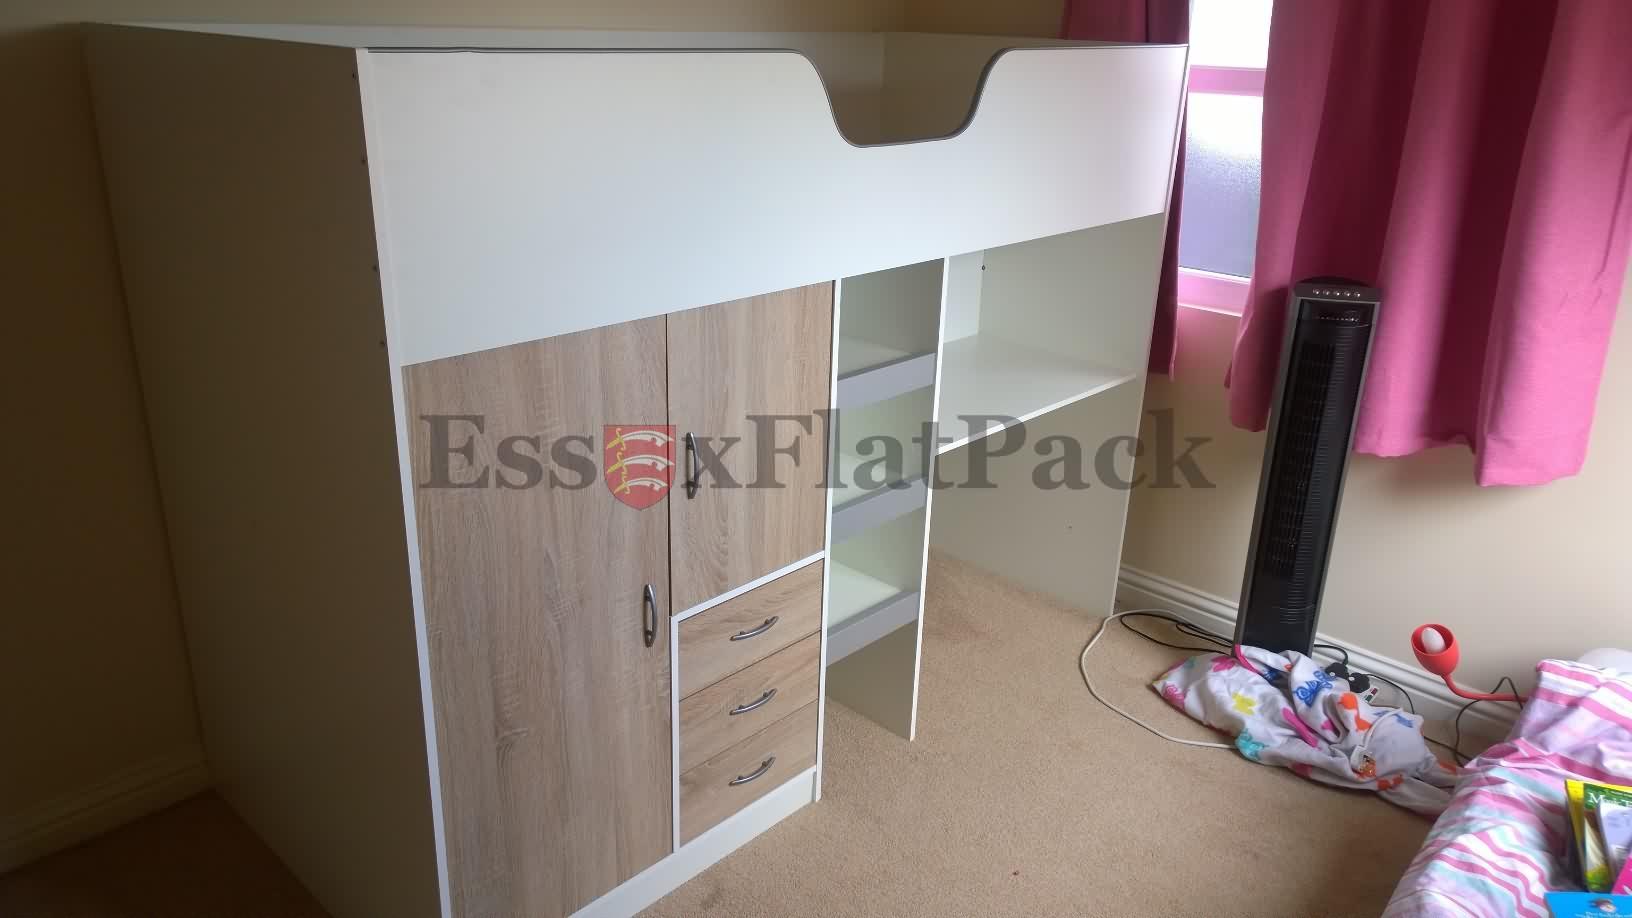 essexflatpack-cabin-bunks-20150729103314.jpg